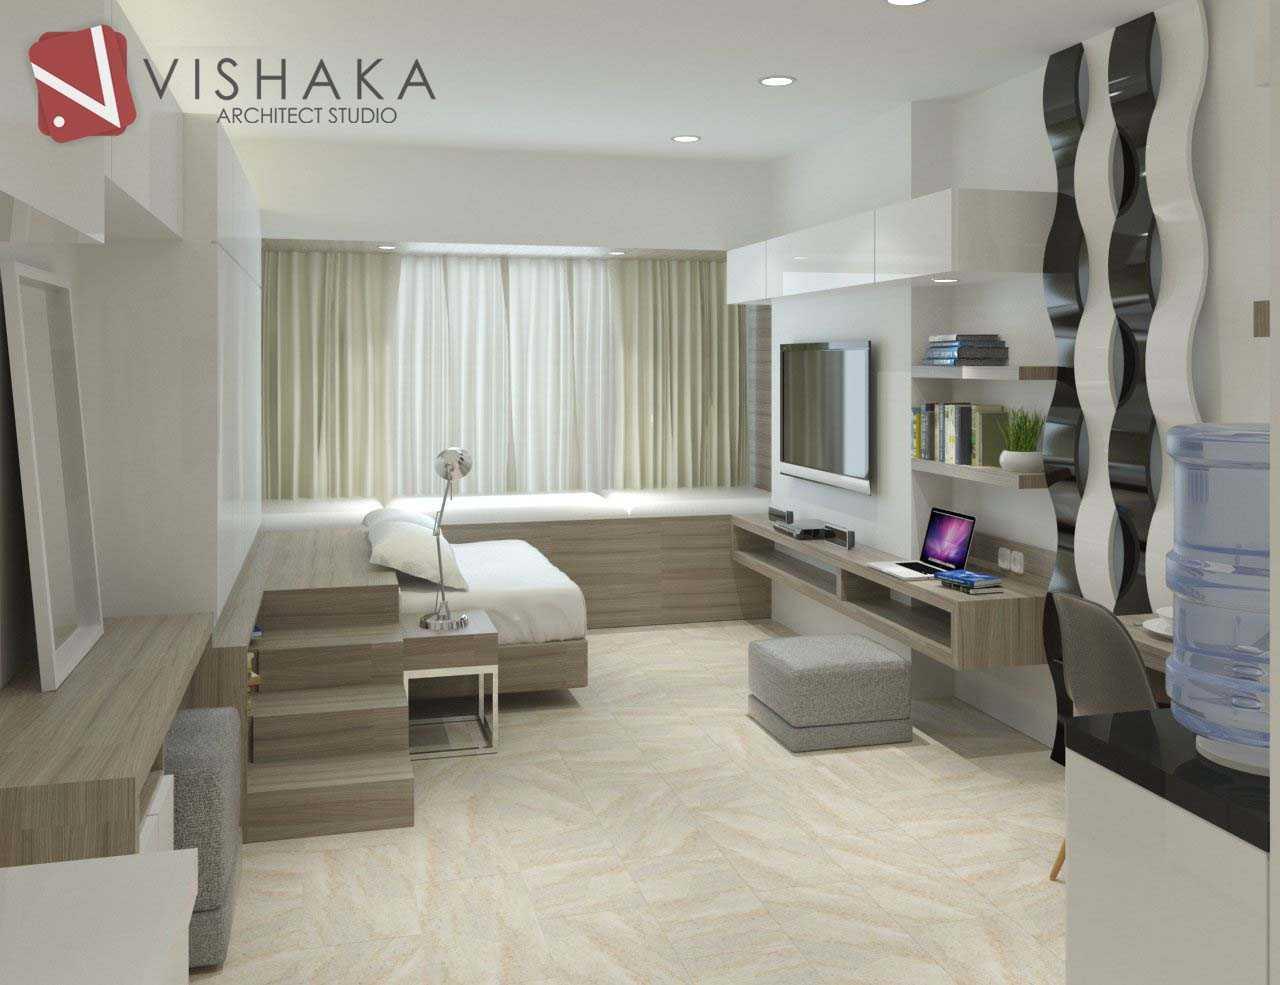 project interior apartment desain arsitek oleh vishaka architect